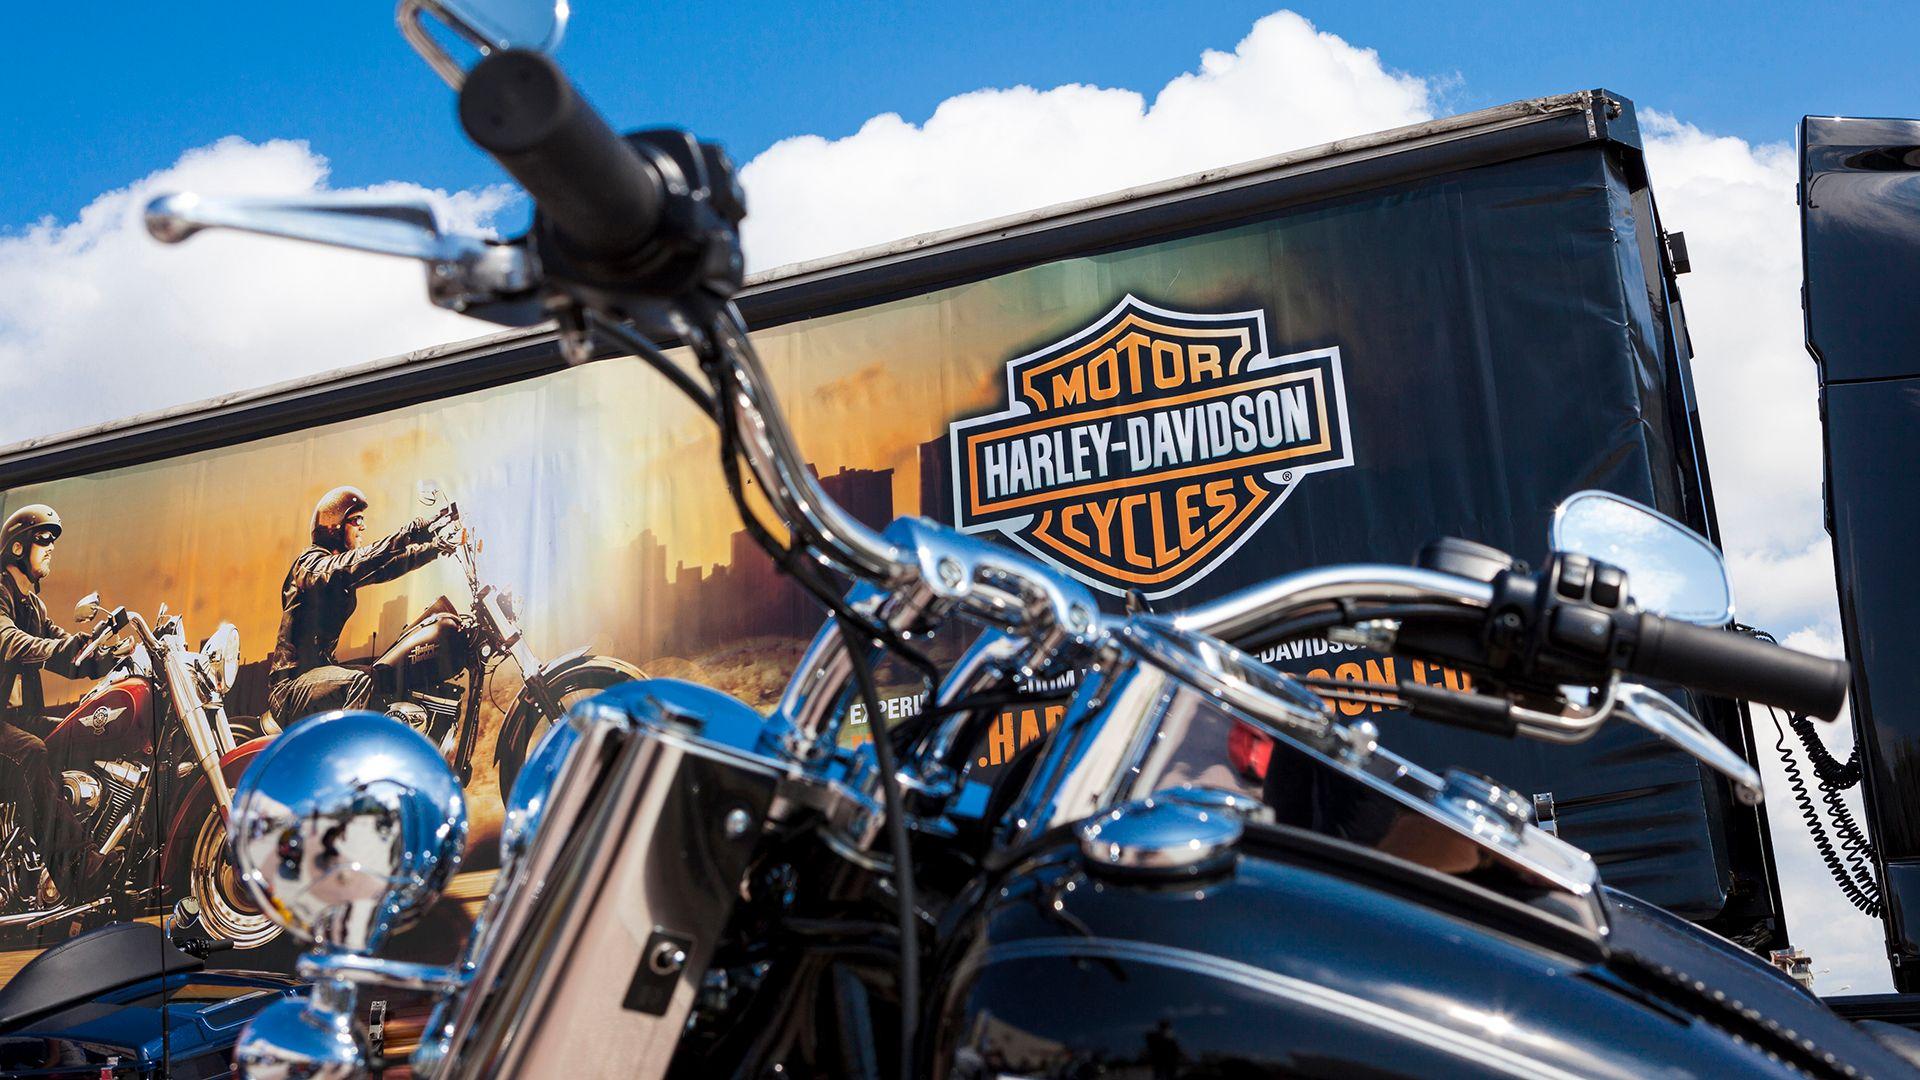 Antalya, Turkey - May 12, 2013: Harley Davidson is Americas greatest manufacturer of motor cycles.